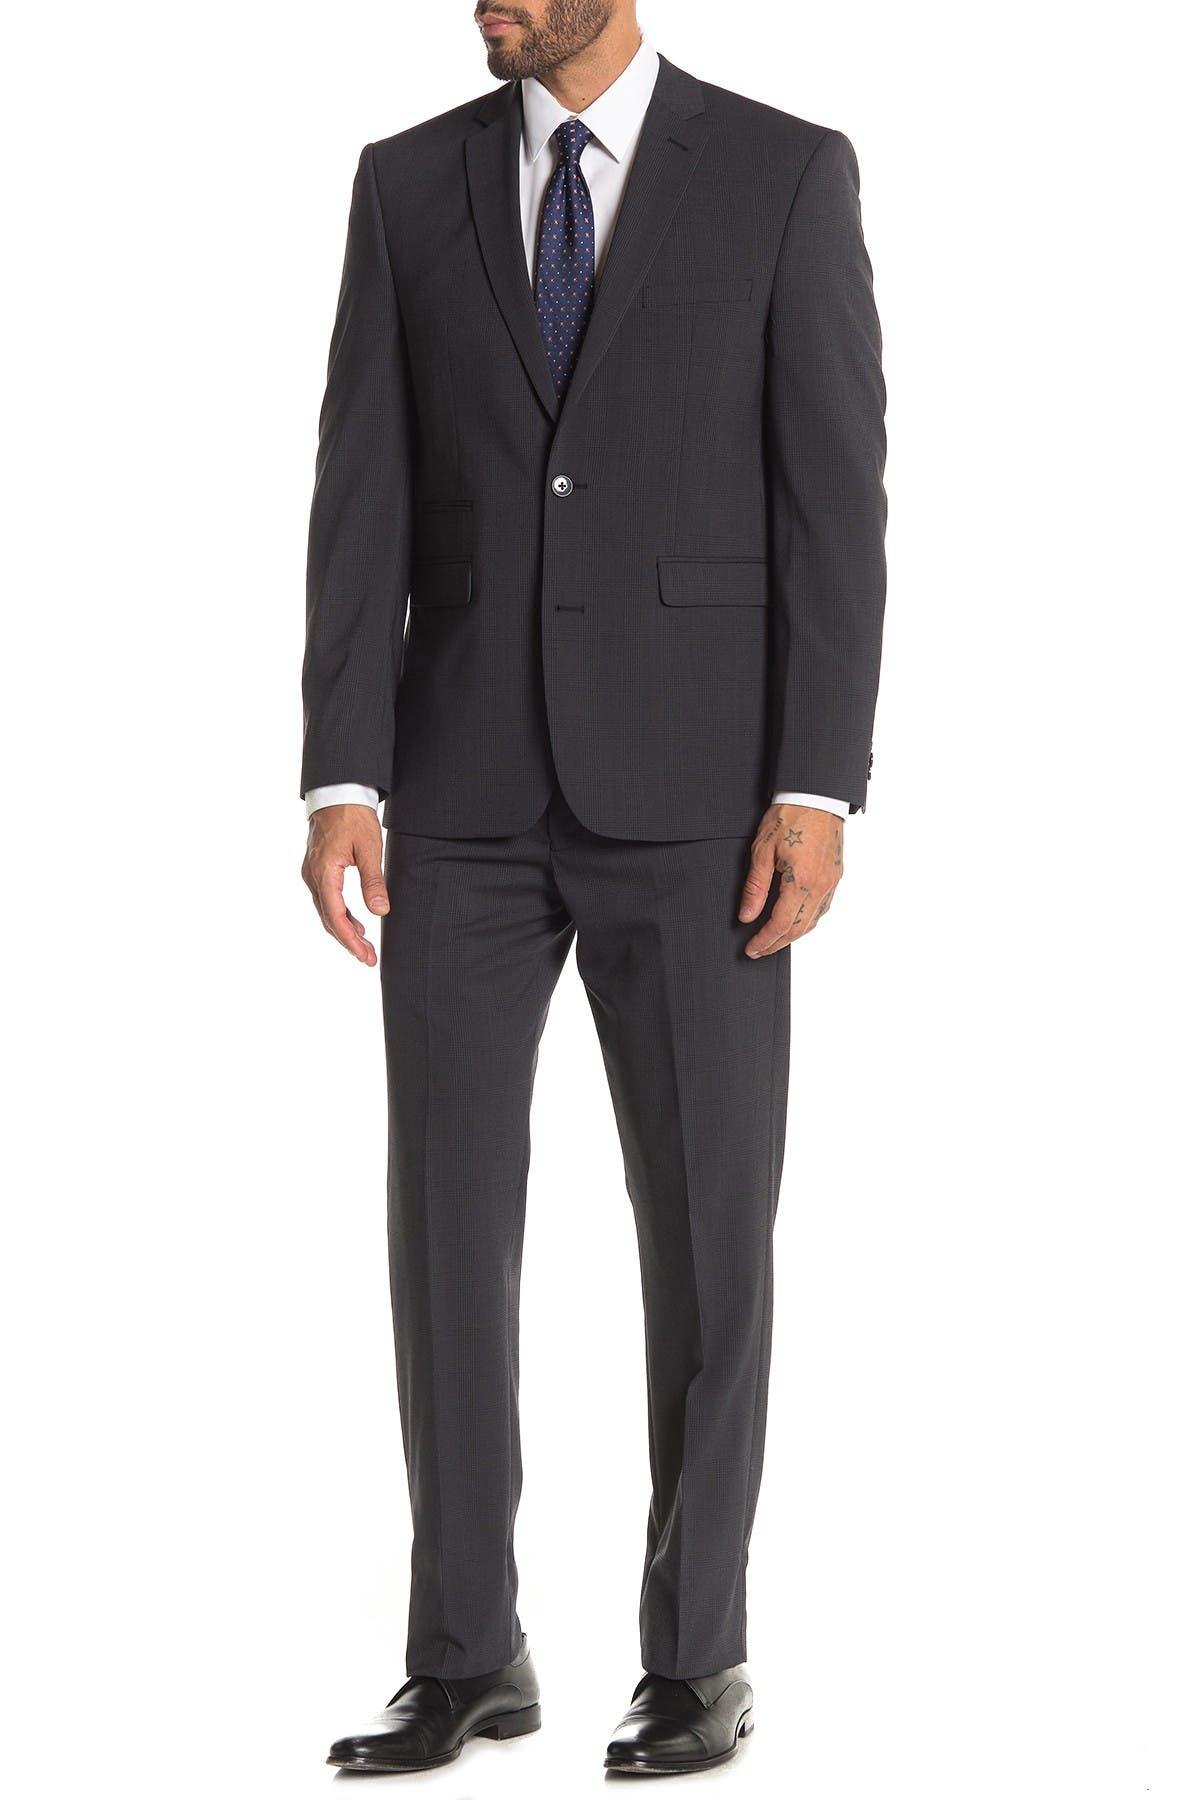 Image of Vince Camuto Dark Grey Plaid Two Button Notch Lapel Slim Fit Suit